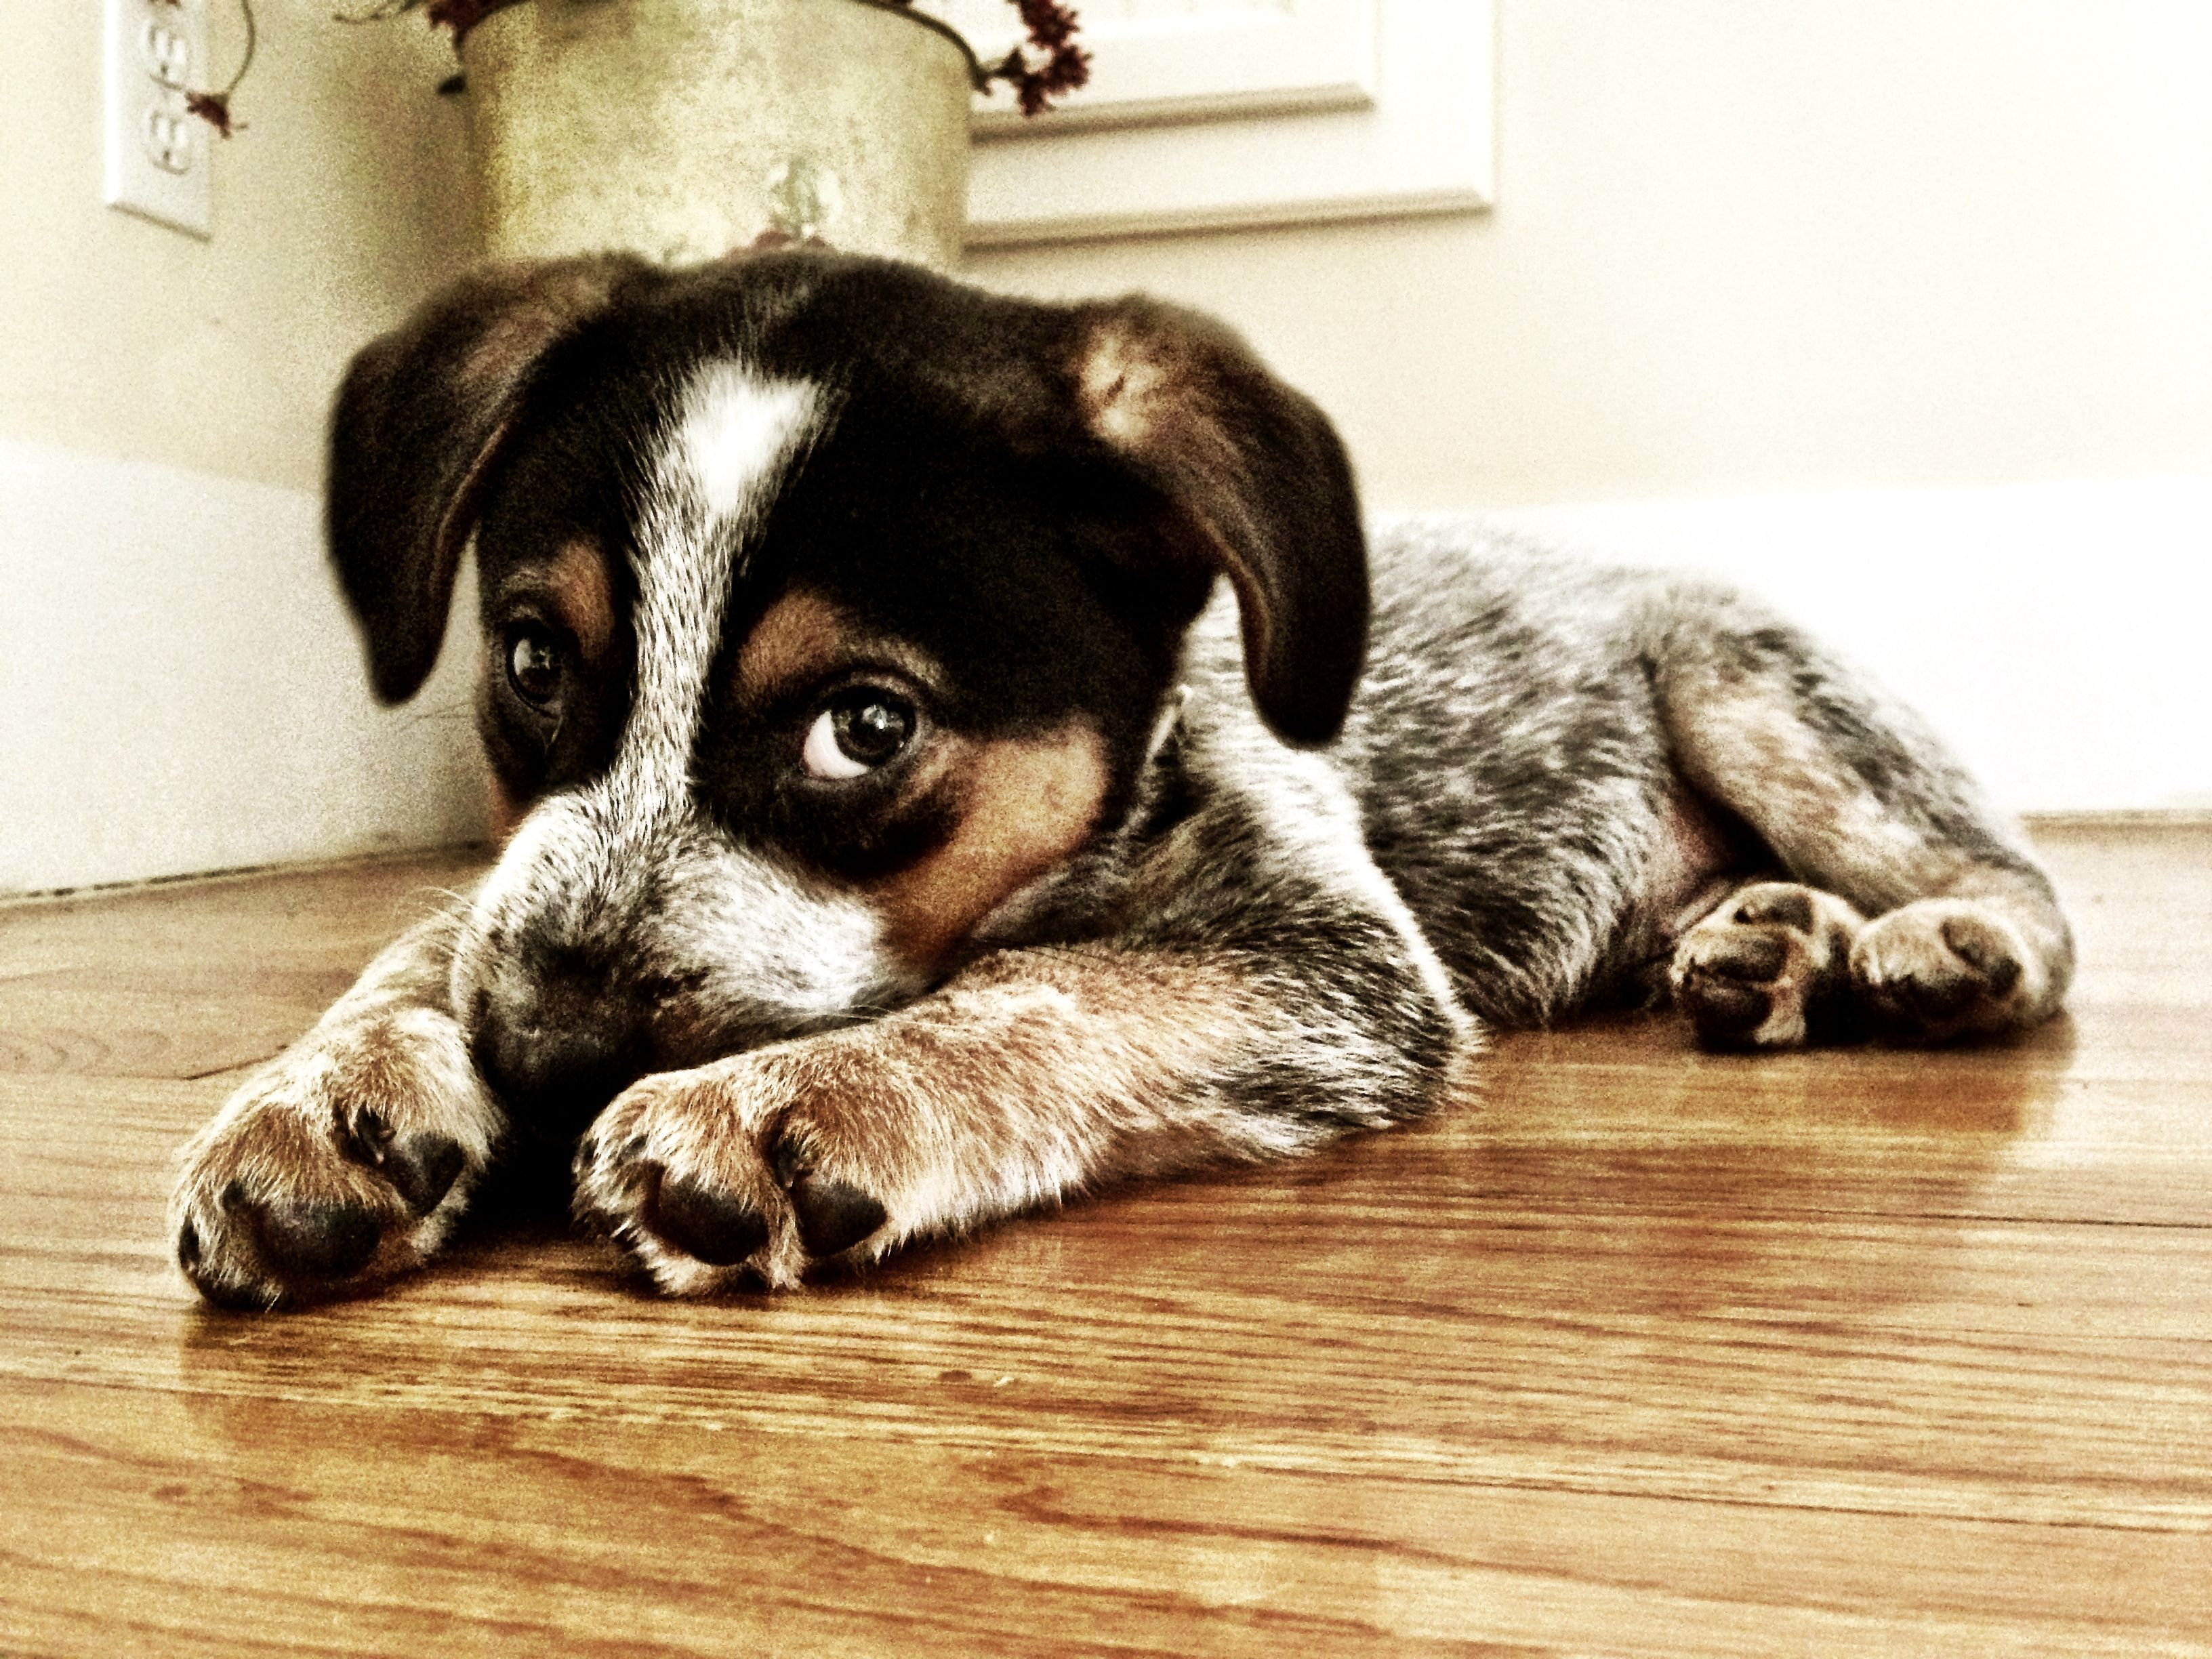 Northeast ohio blue heeler dogs puppies for sale ebay180 - Blue Heeler Beagle Mix Beagle Mixanimals Dogpuppy